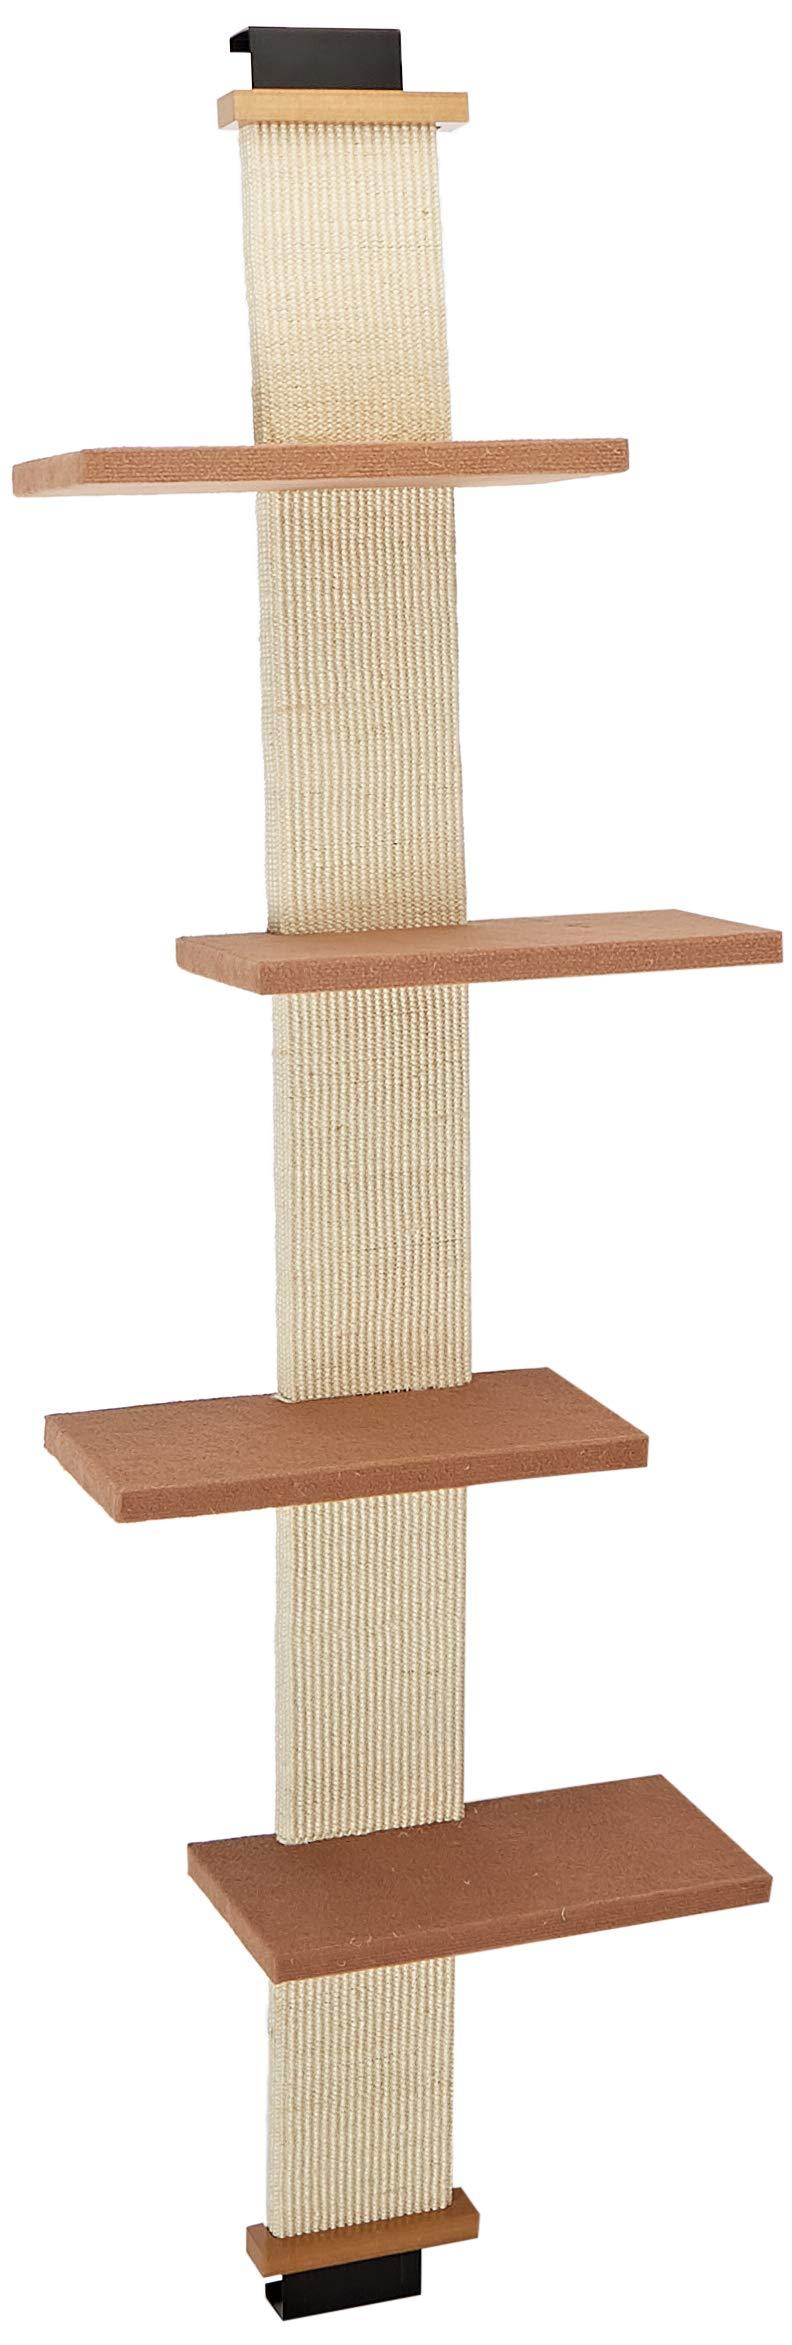 SmartCat Multi-Level Cat Climber by SmartCat